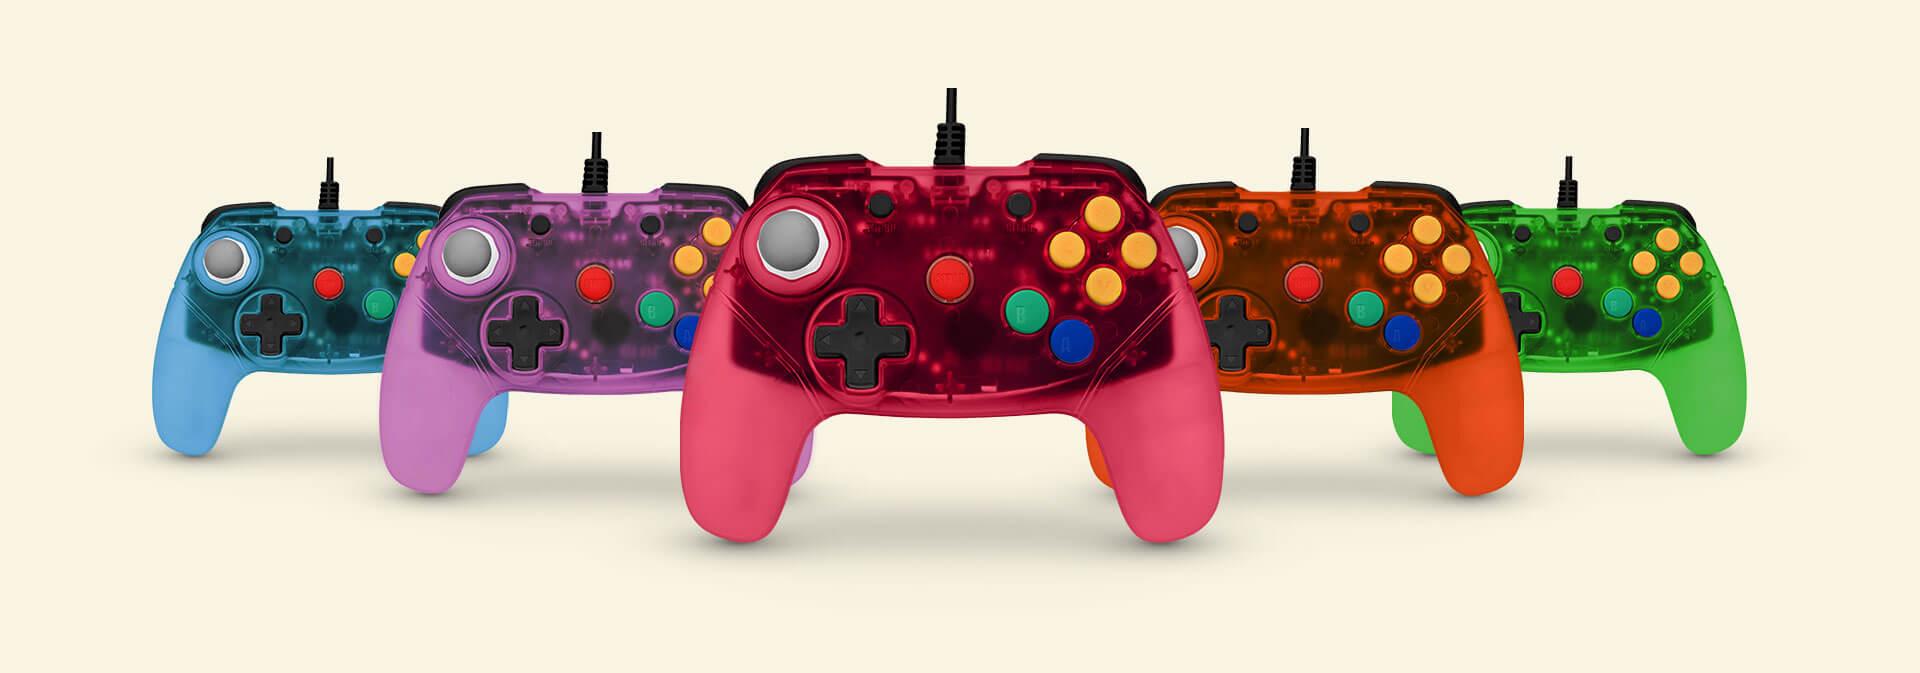 Brawler64 N64 Controller (Colors)